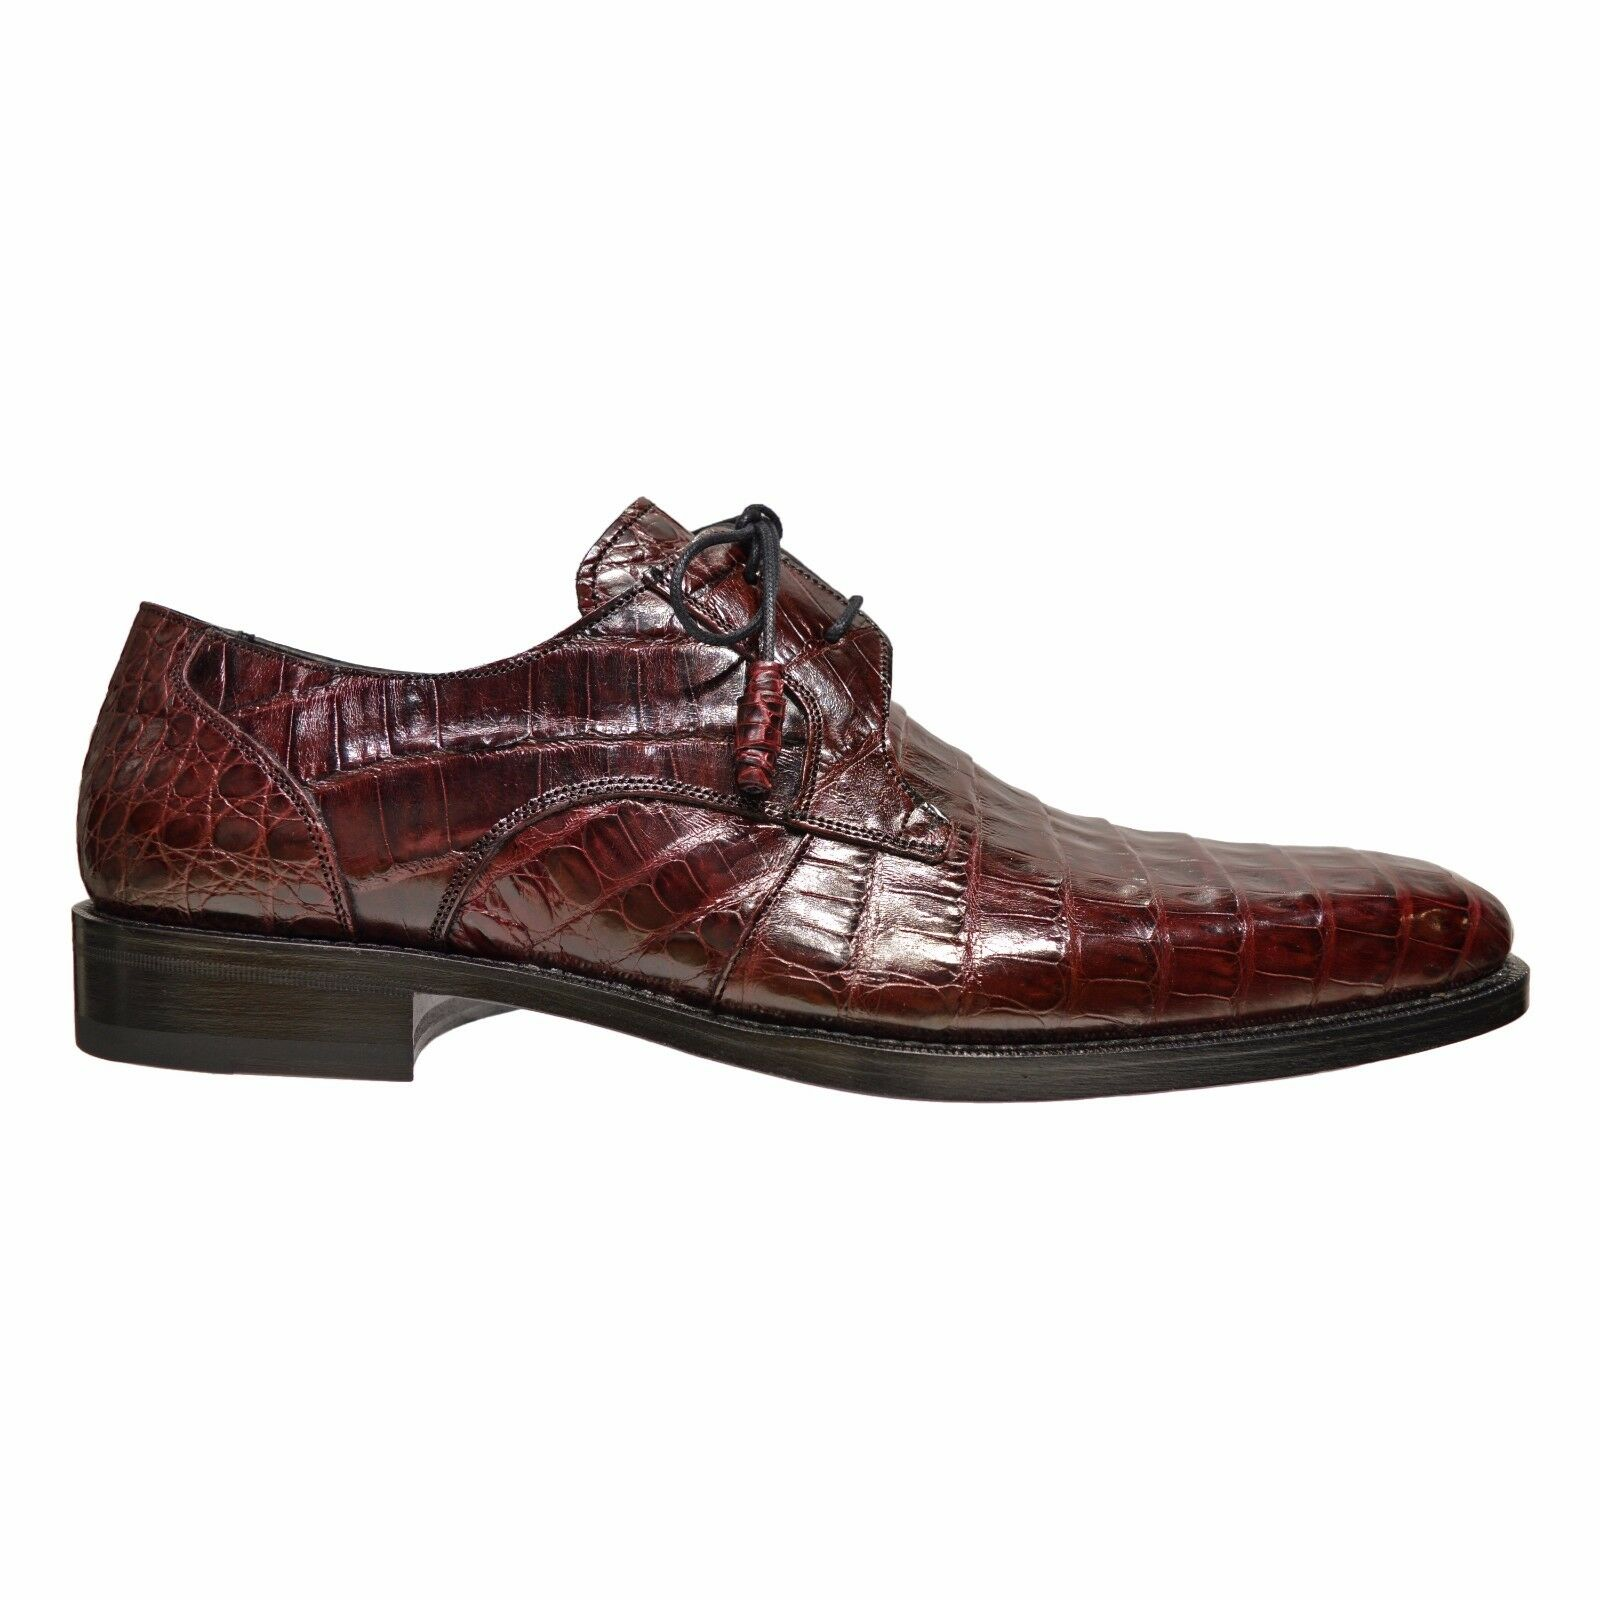 Mezlan Anderson Men's Genuine Crocodile Skin Oxford Lace Up shoes Burgundy